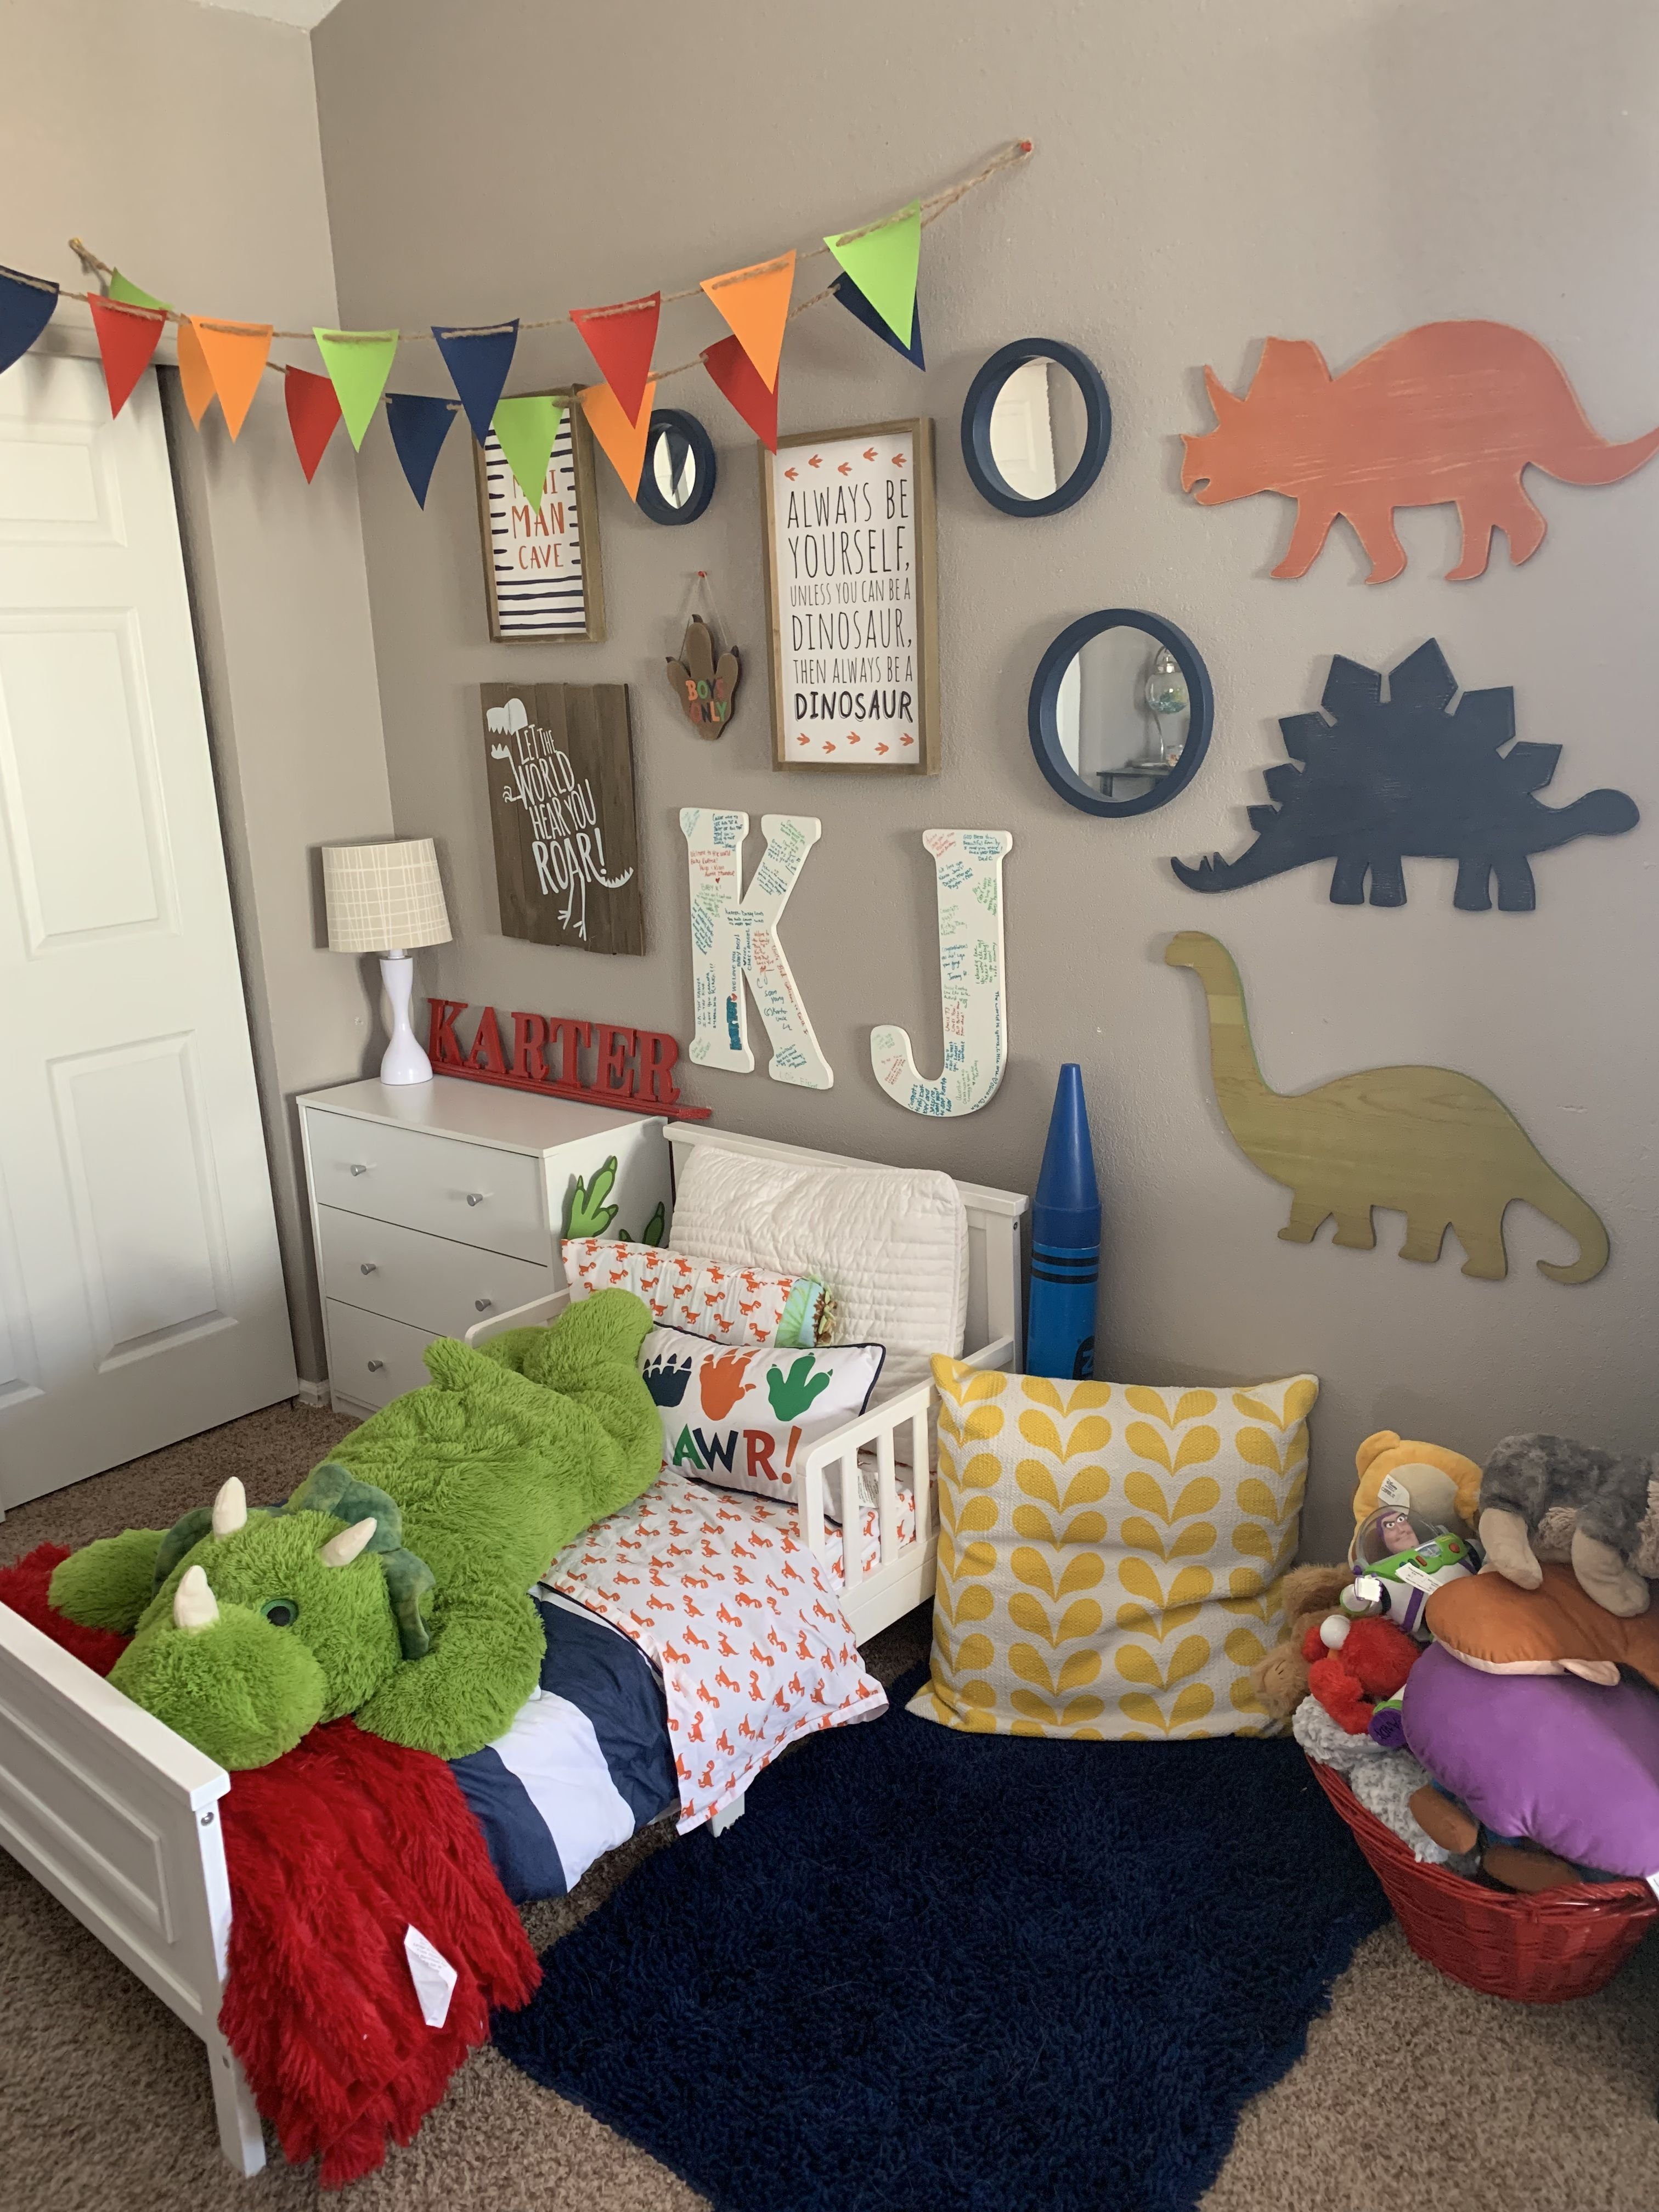 Toddler Room Ideas For Boys Theme Toddler Room Ideas For Boys Dinosaur Toddler Room Boys Bedroom Decor Big Boy Bedrooms